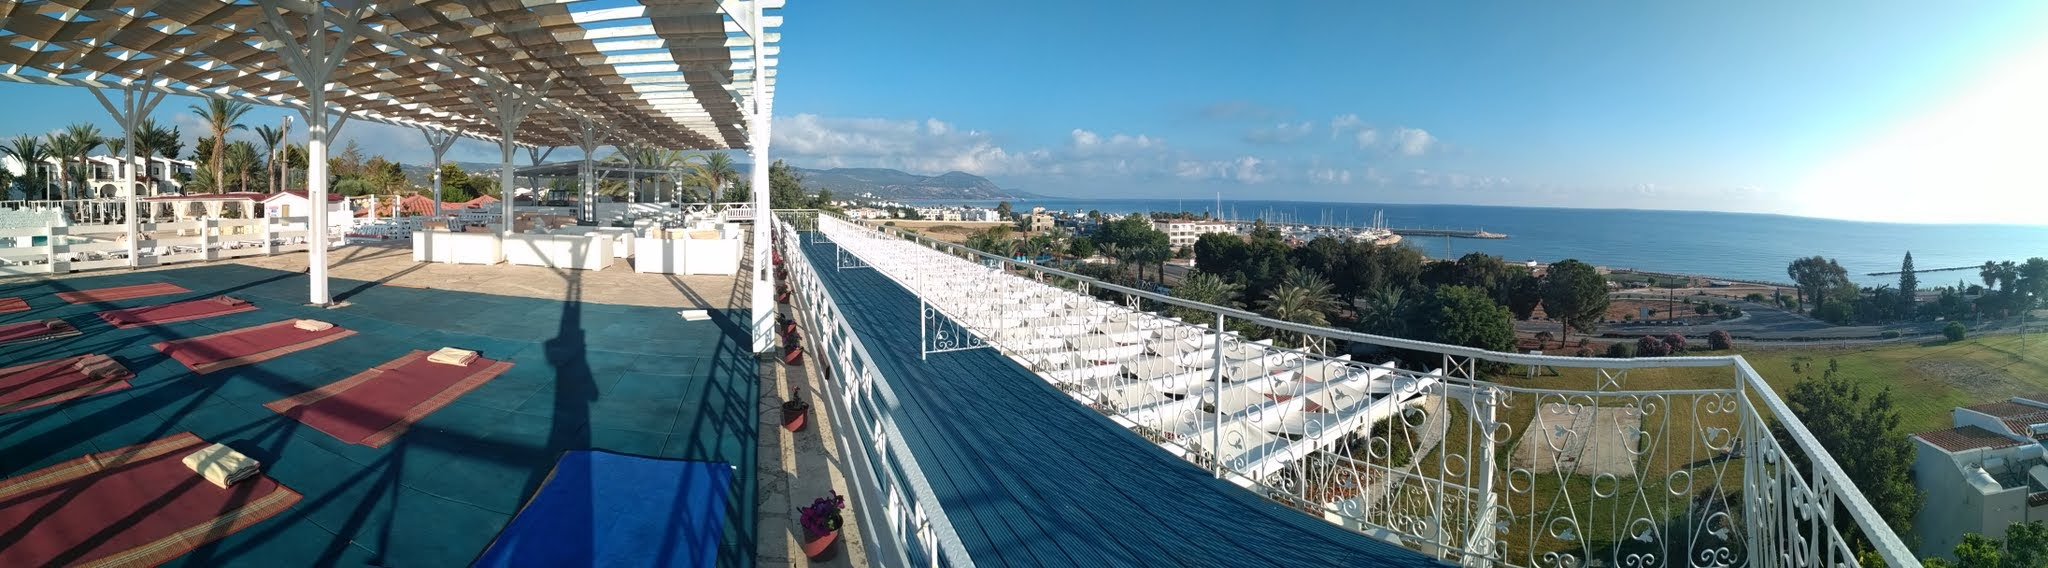 zening resort cyprus hotel ecoresort beach (144)